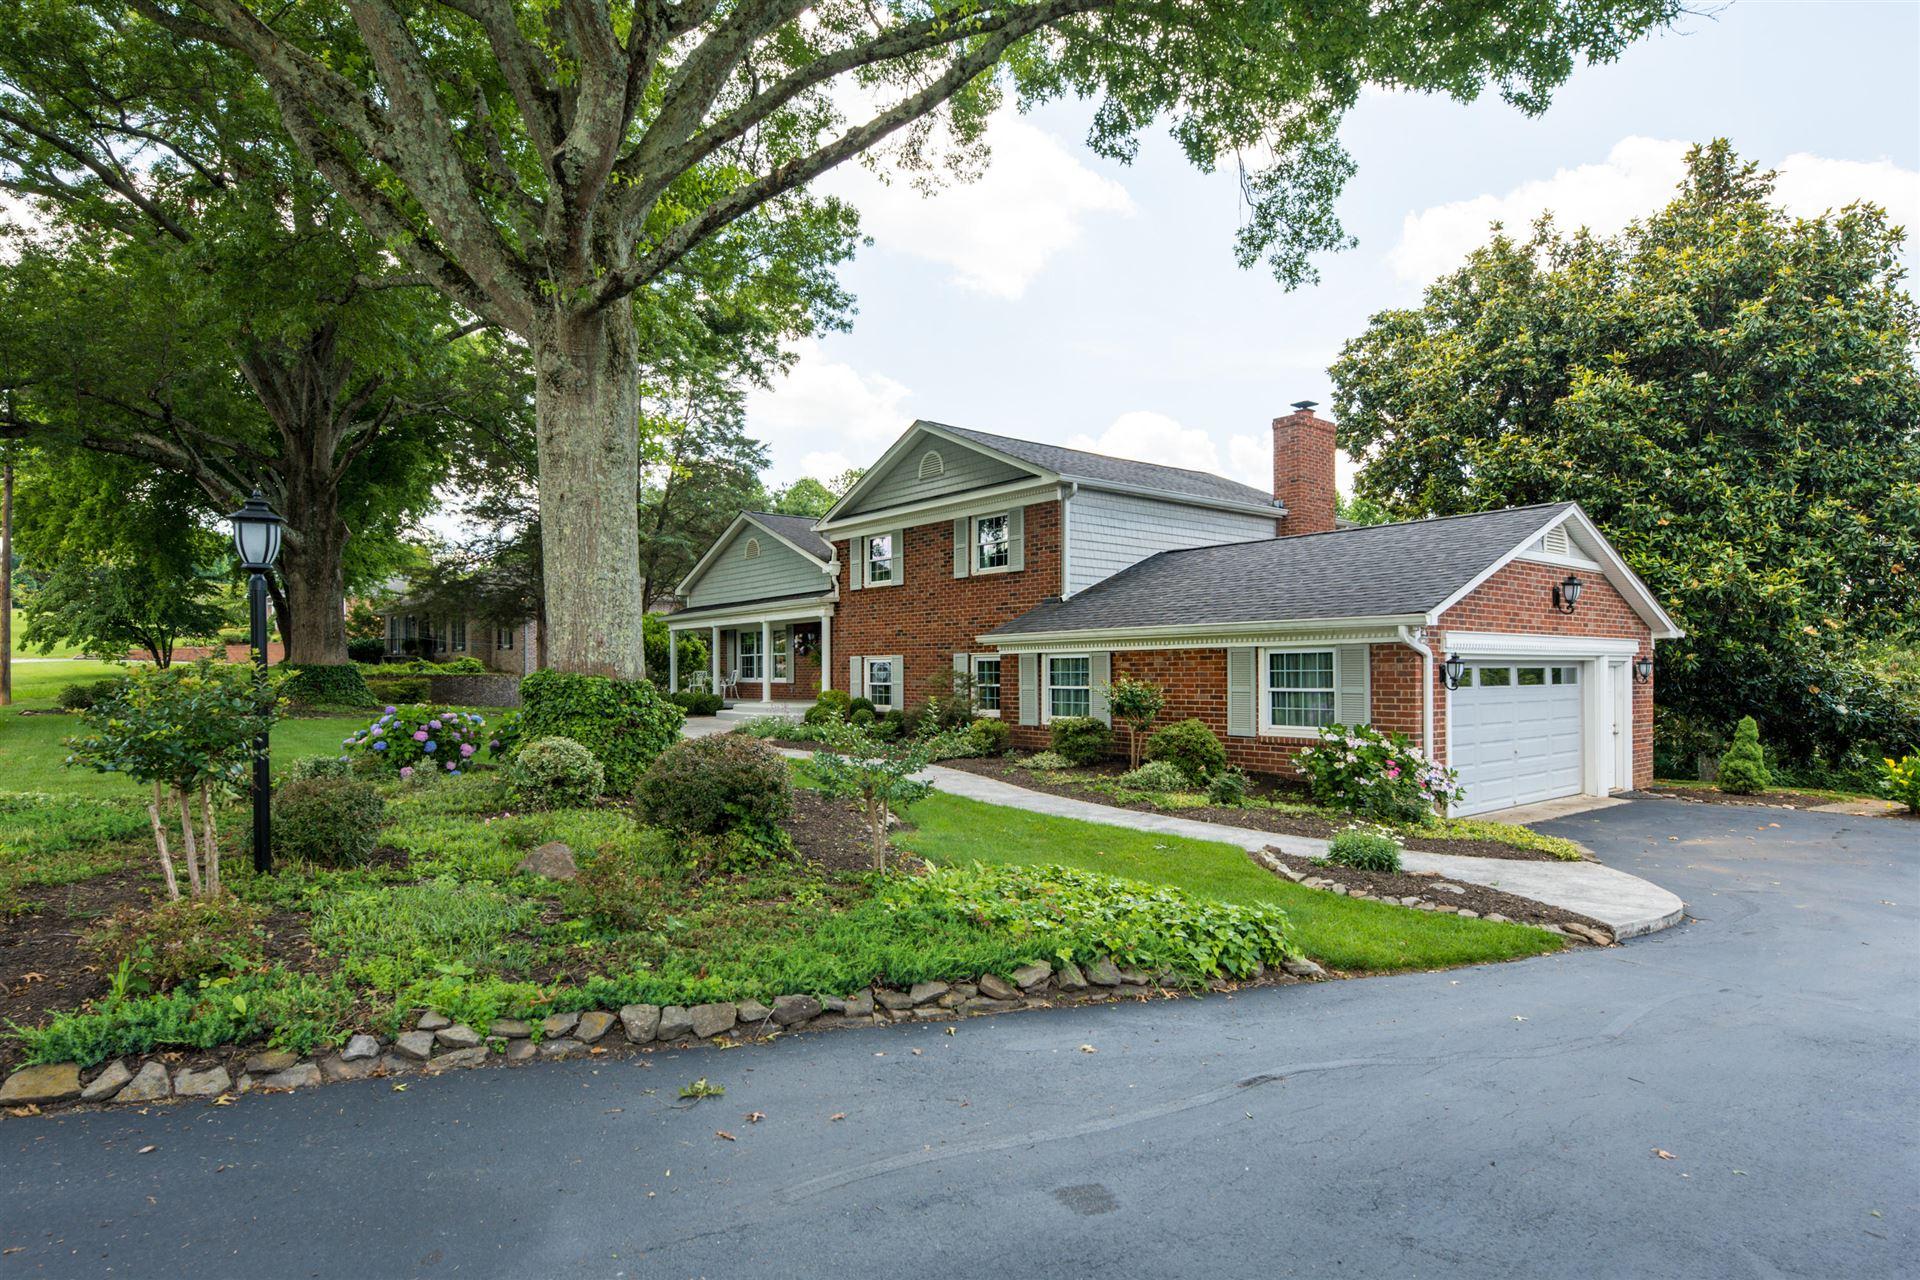 Photo of 9615 Tunbridge Lane, Knoxville, TN 37922 (MLS # 1156856)